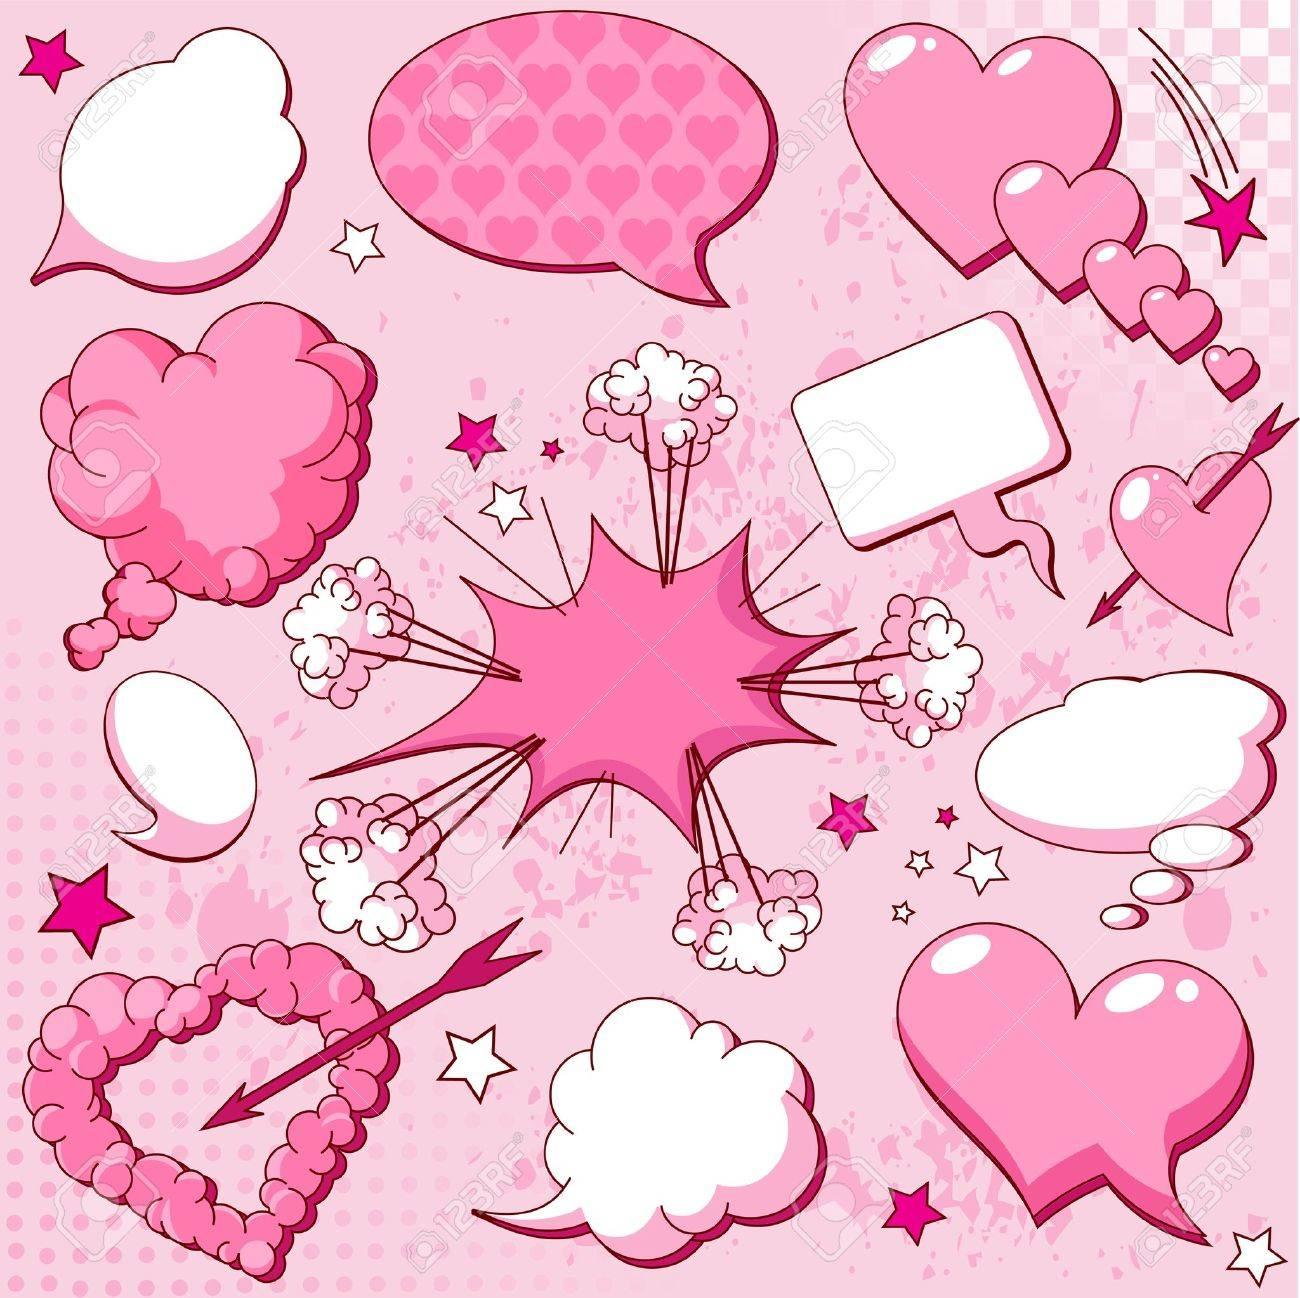 Comics Style Love Speech Bubbles Royalty Free Cliparts, Vectors ...